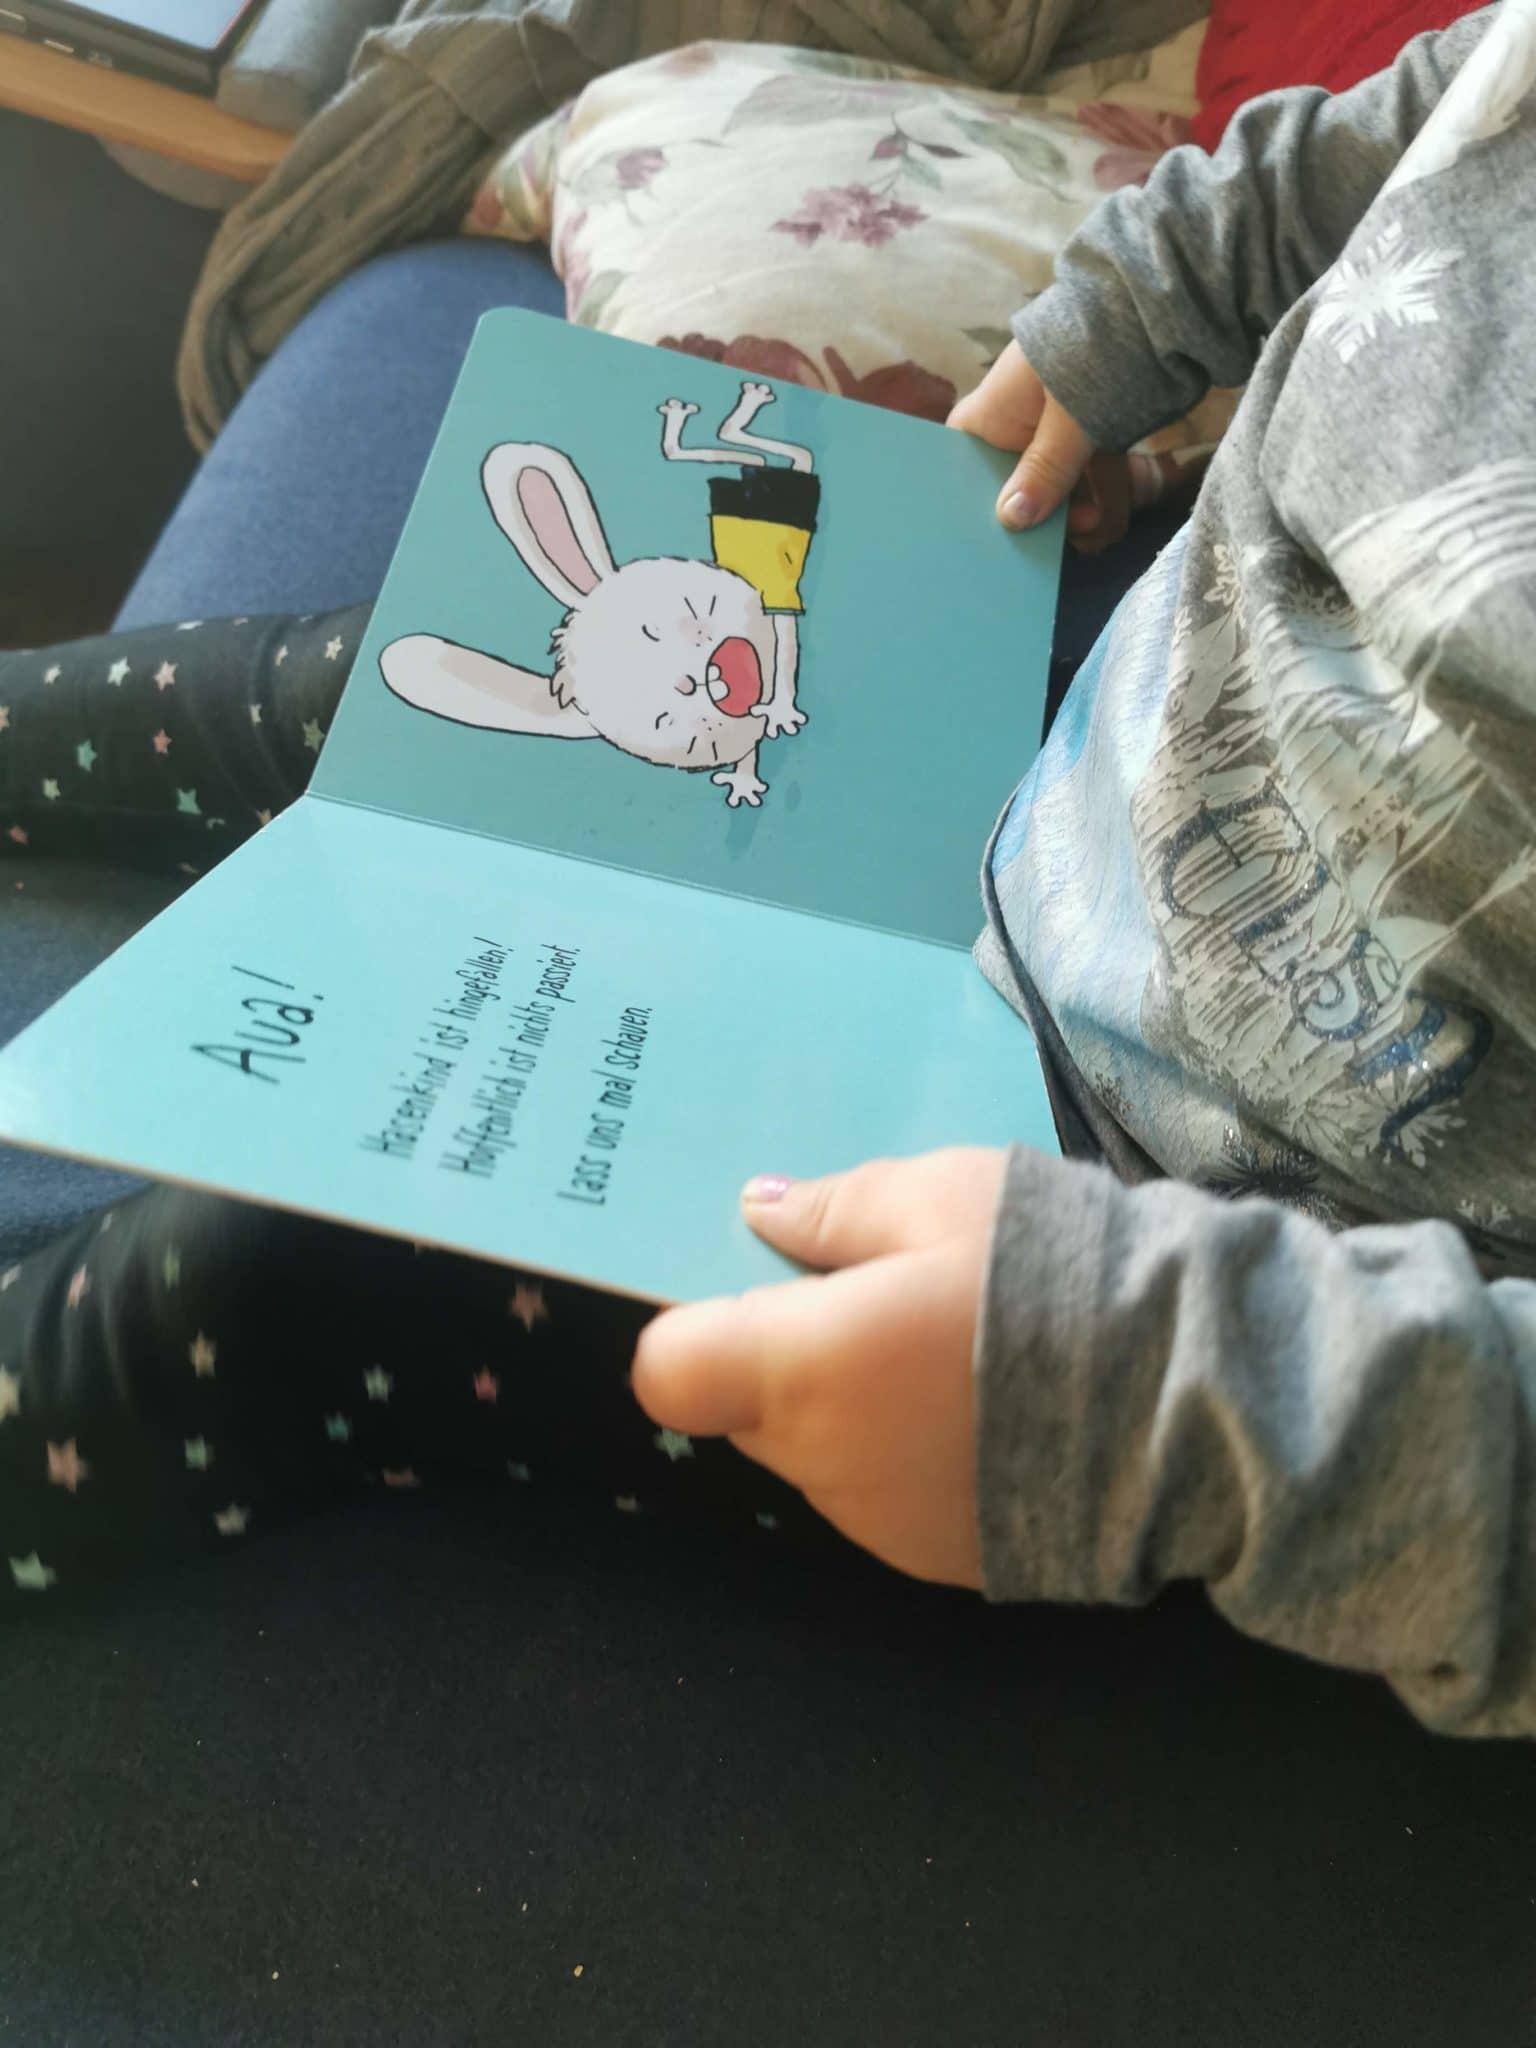 Coronatagebuch mit Kindern